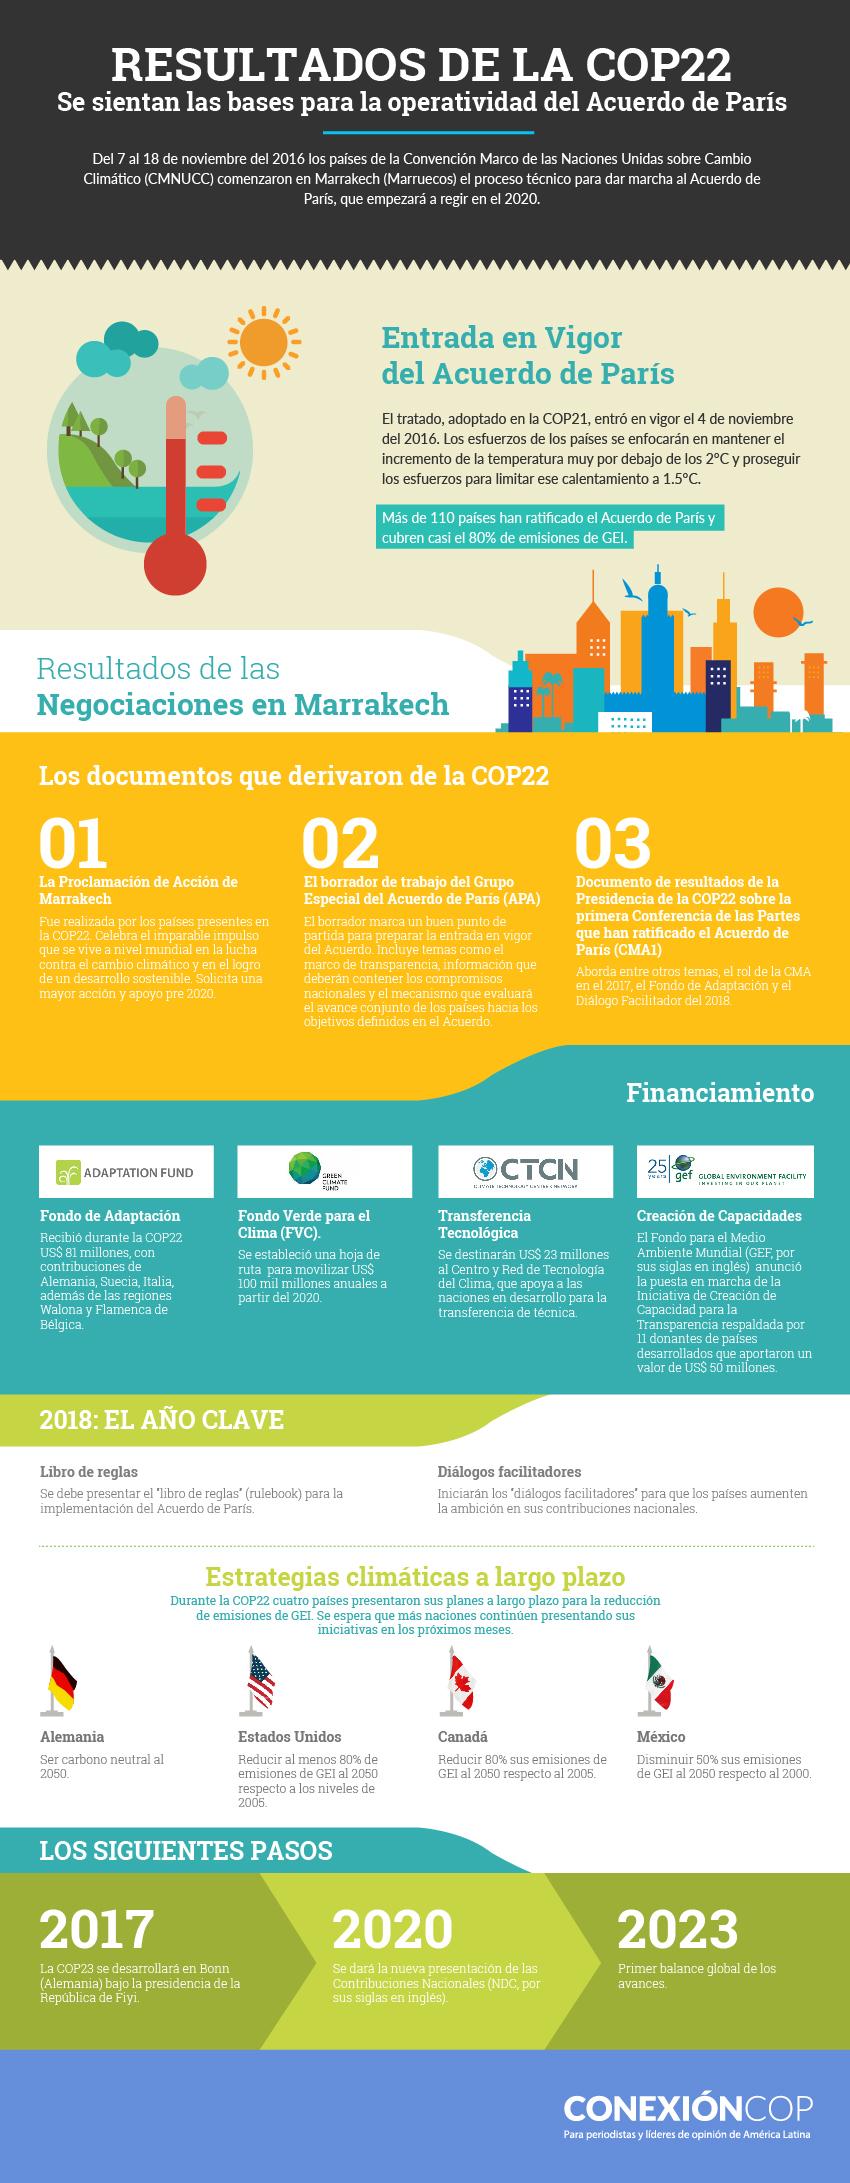 infografia_resultados_COP22_marrakech_cambio_climatico